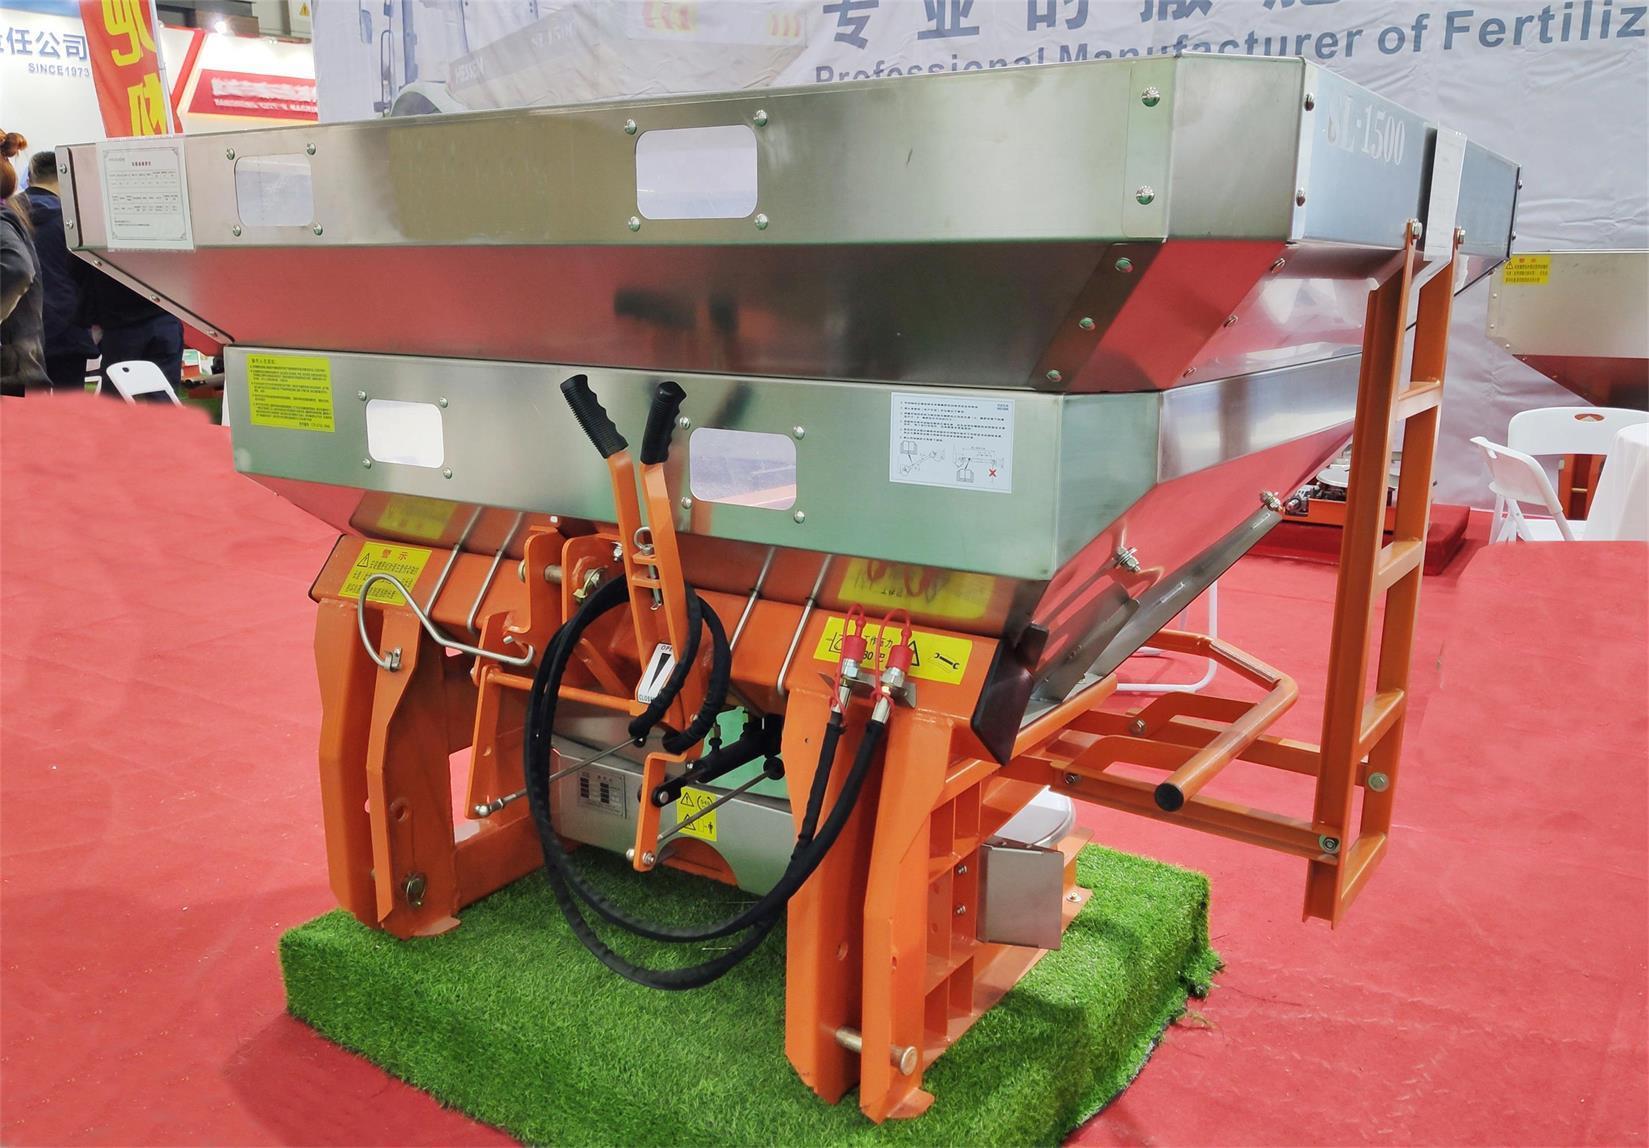 tractor mounted PTO double-disc fertilizer spreader